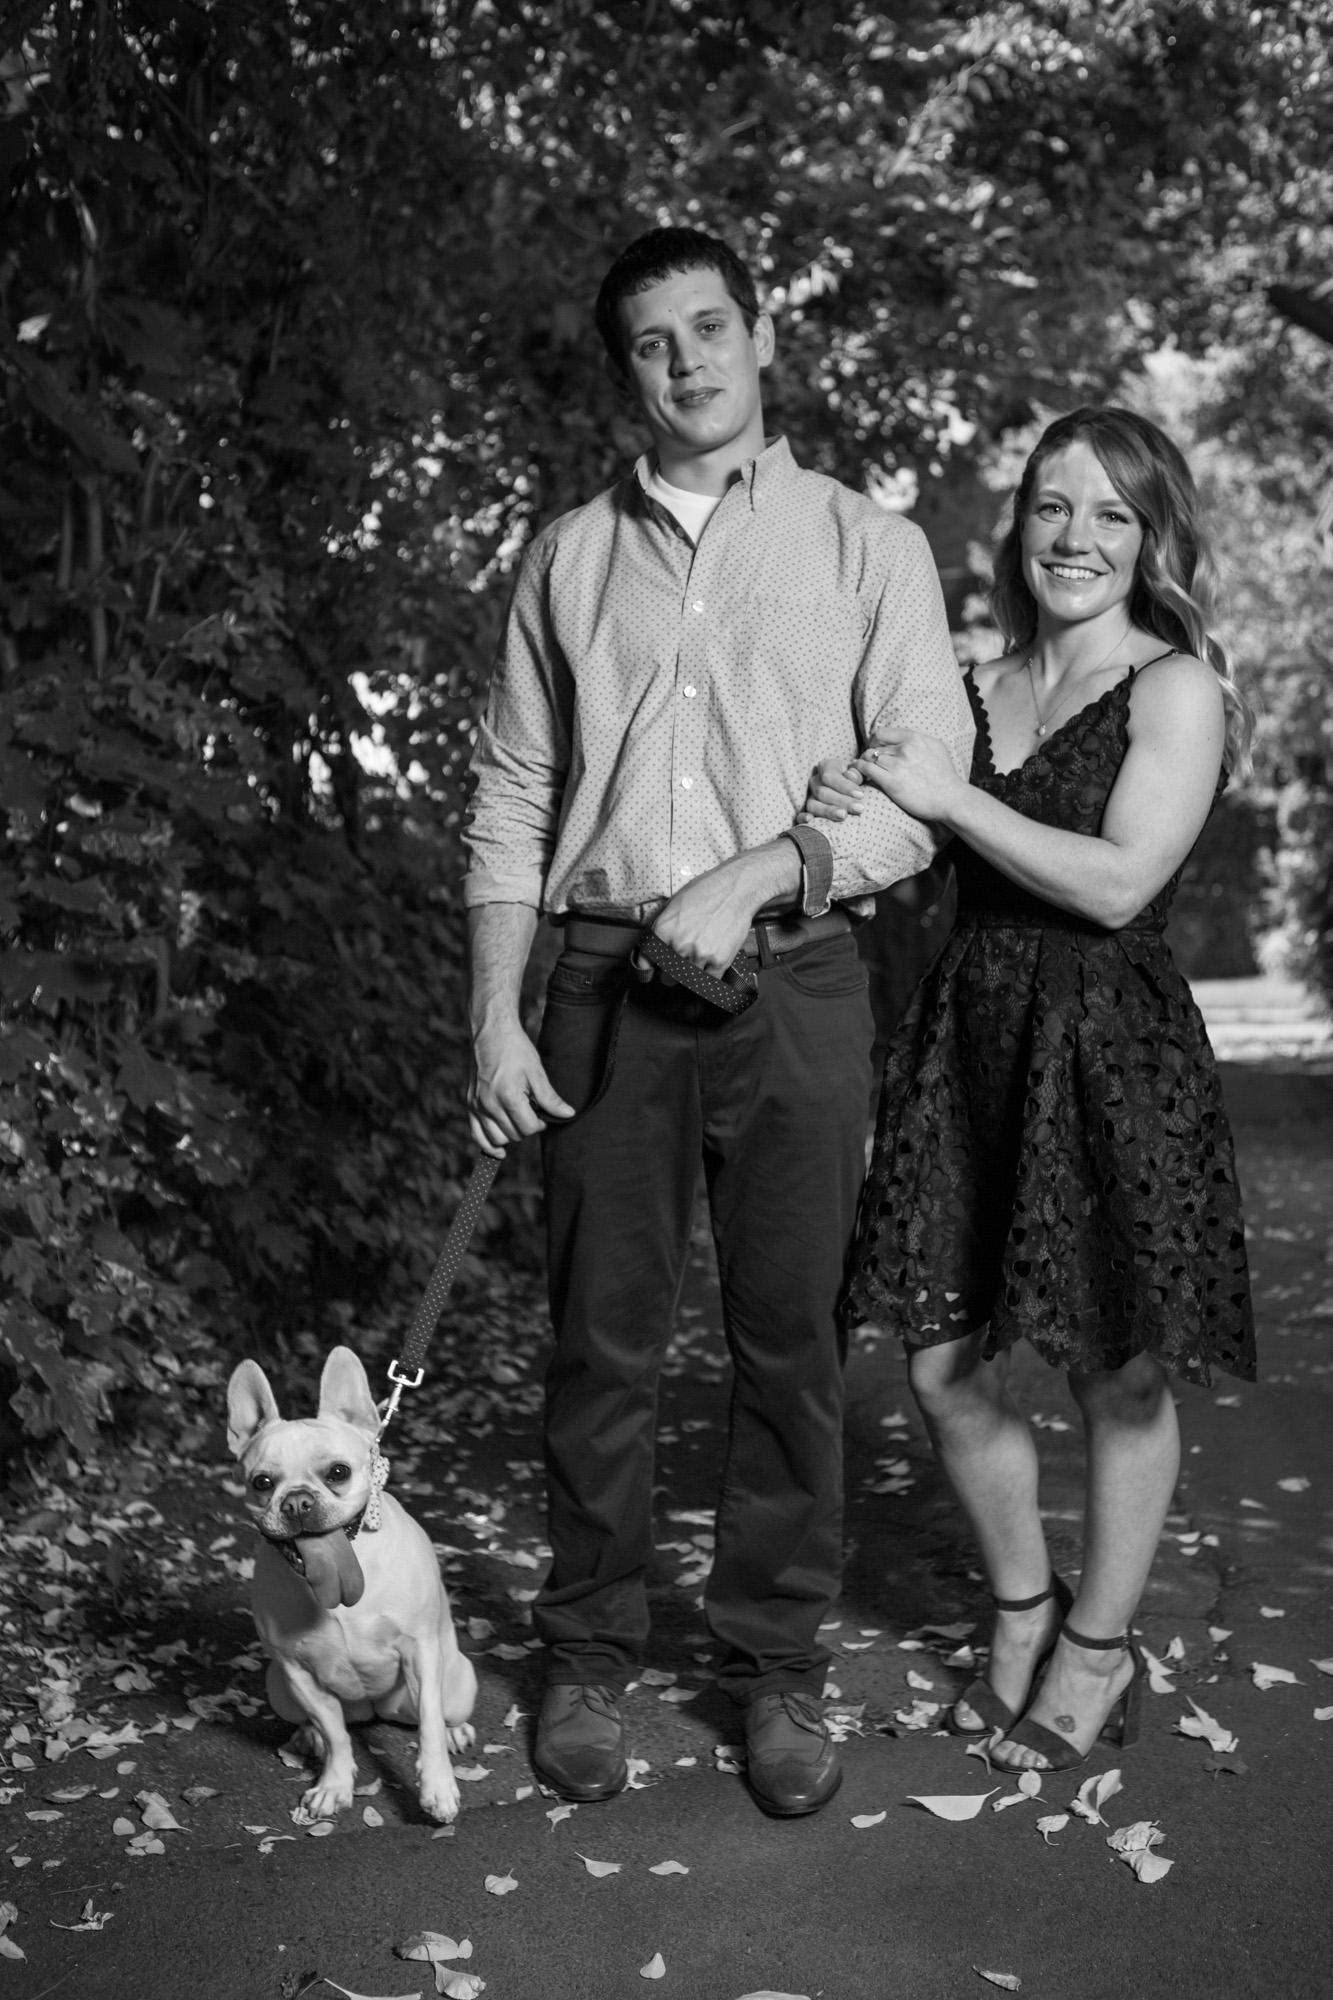 scranton_wedding_photographer_lettieri_pa (4 of 19).jpg